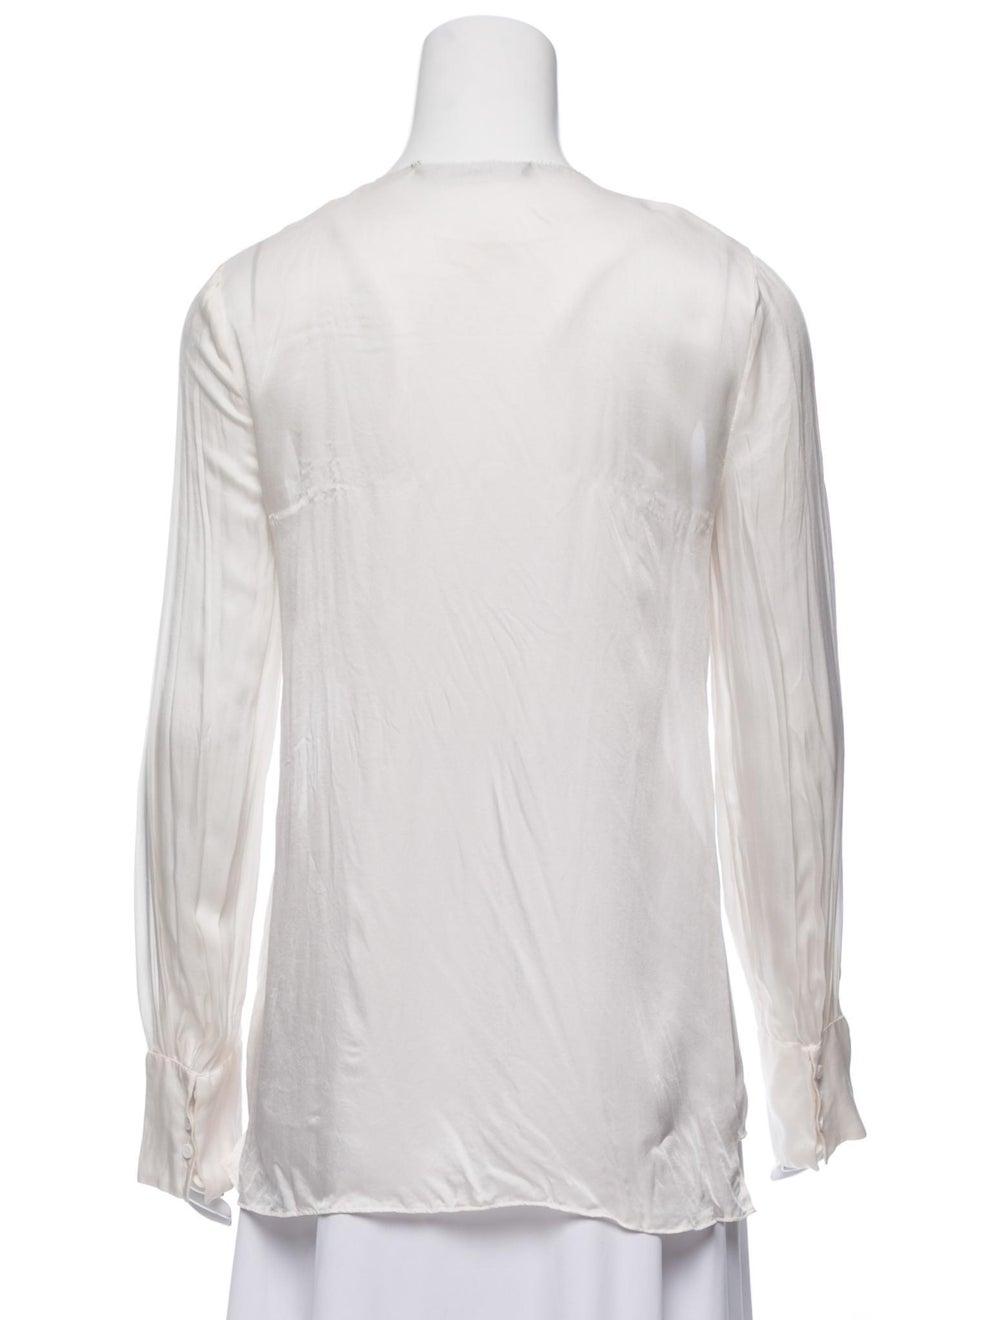 Givenchy Silk Long Sleeve Blouse - image 3